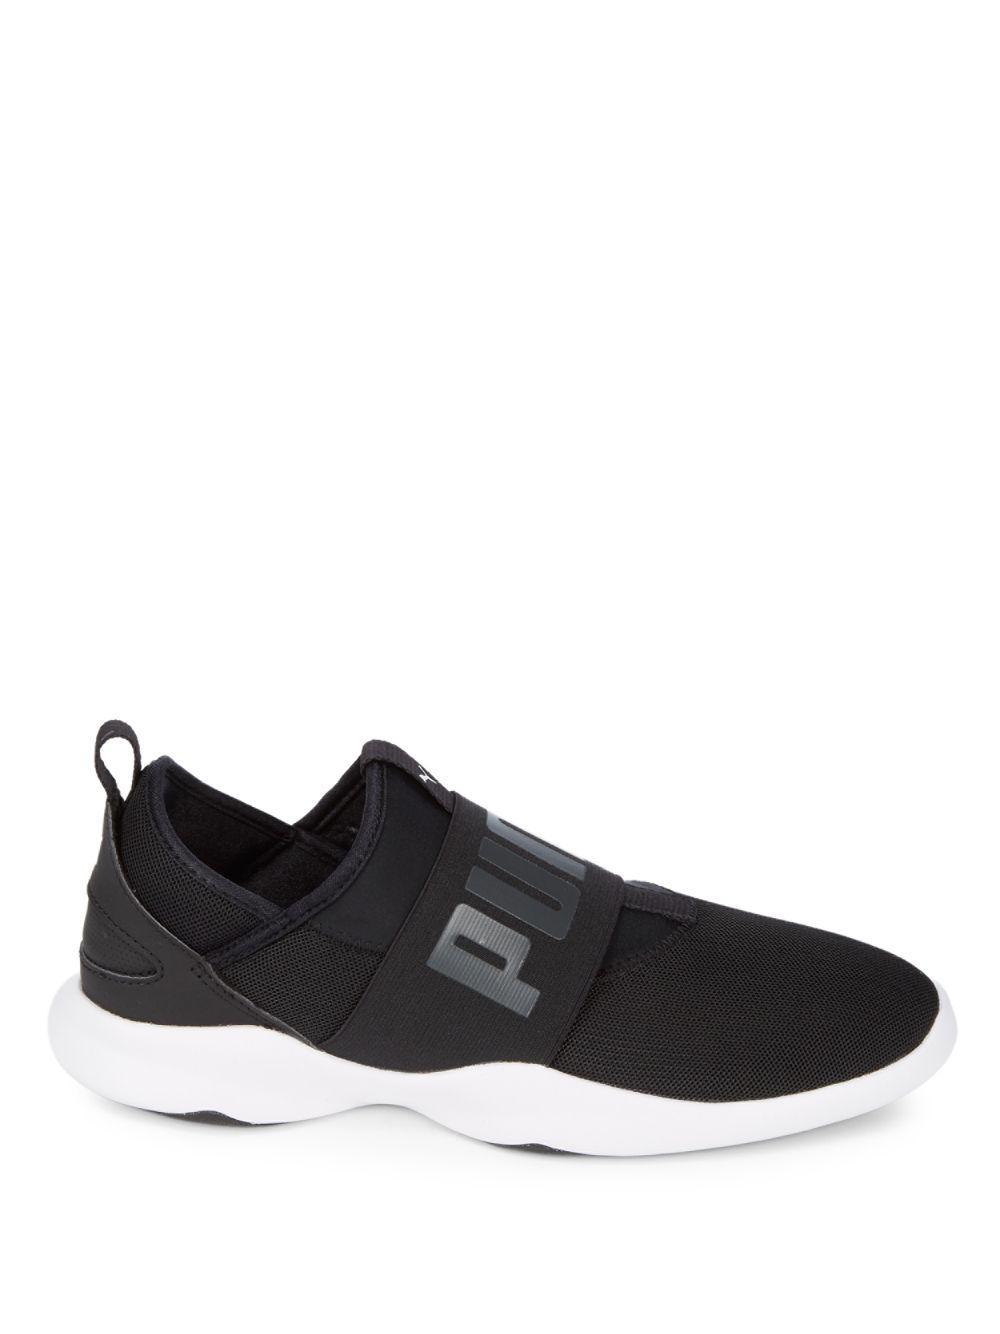 258ed208155 Lyst - PUMA Dare Mesh Slip-on Sneakers in Black